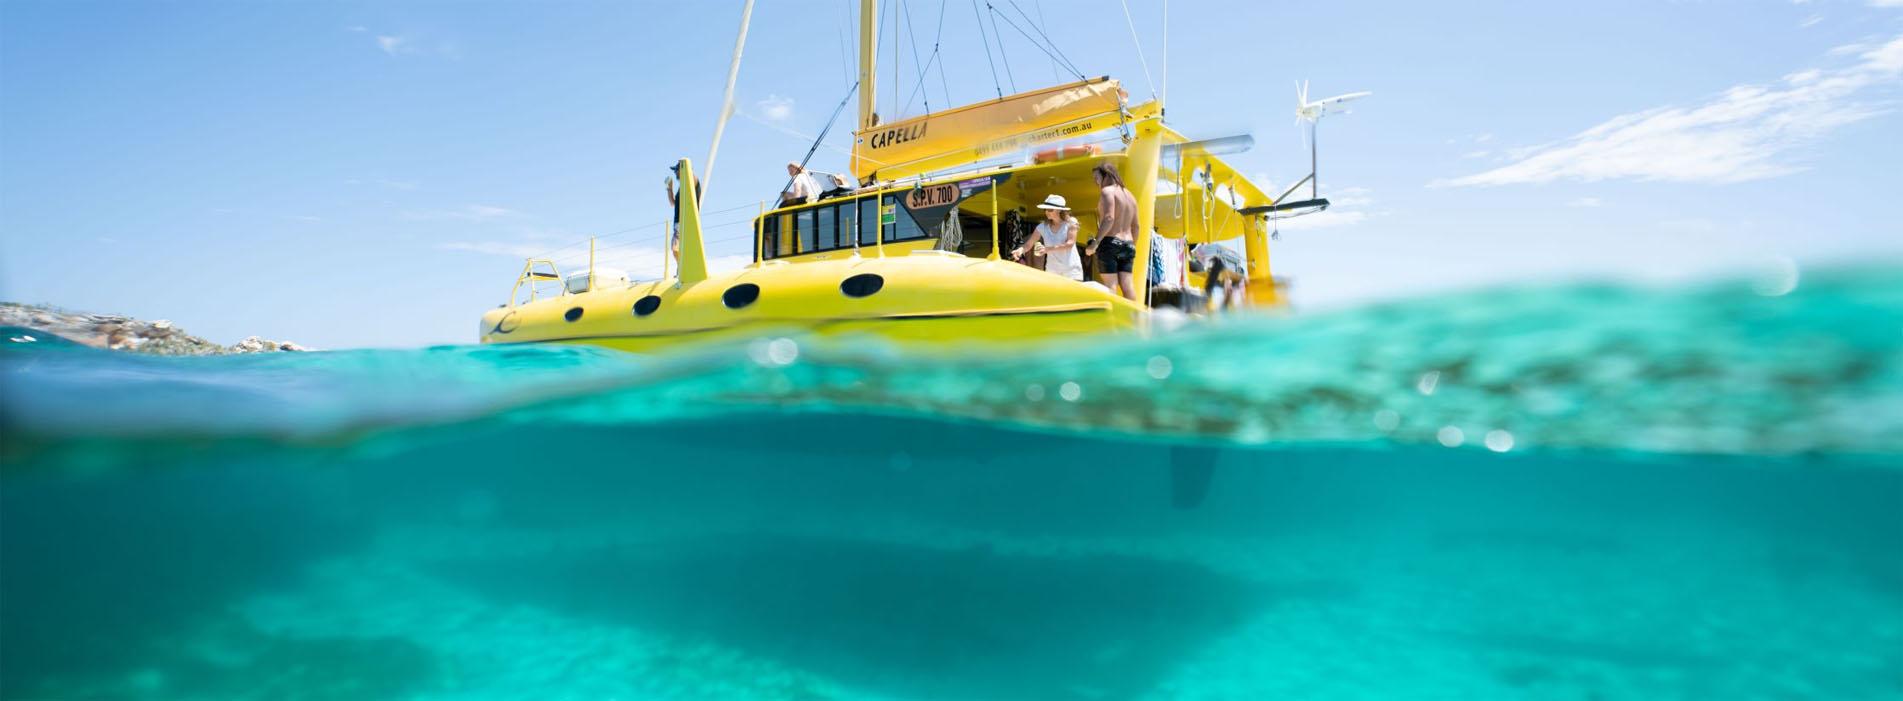 CARNAC ISLAND HALF DAY ECO SAIL TOUR PERTH FREMANTLE